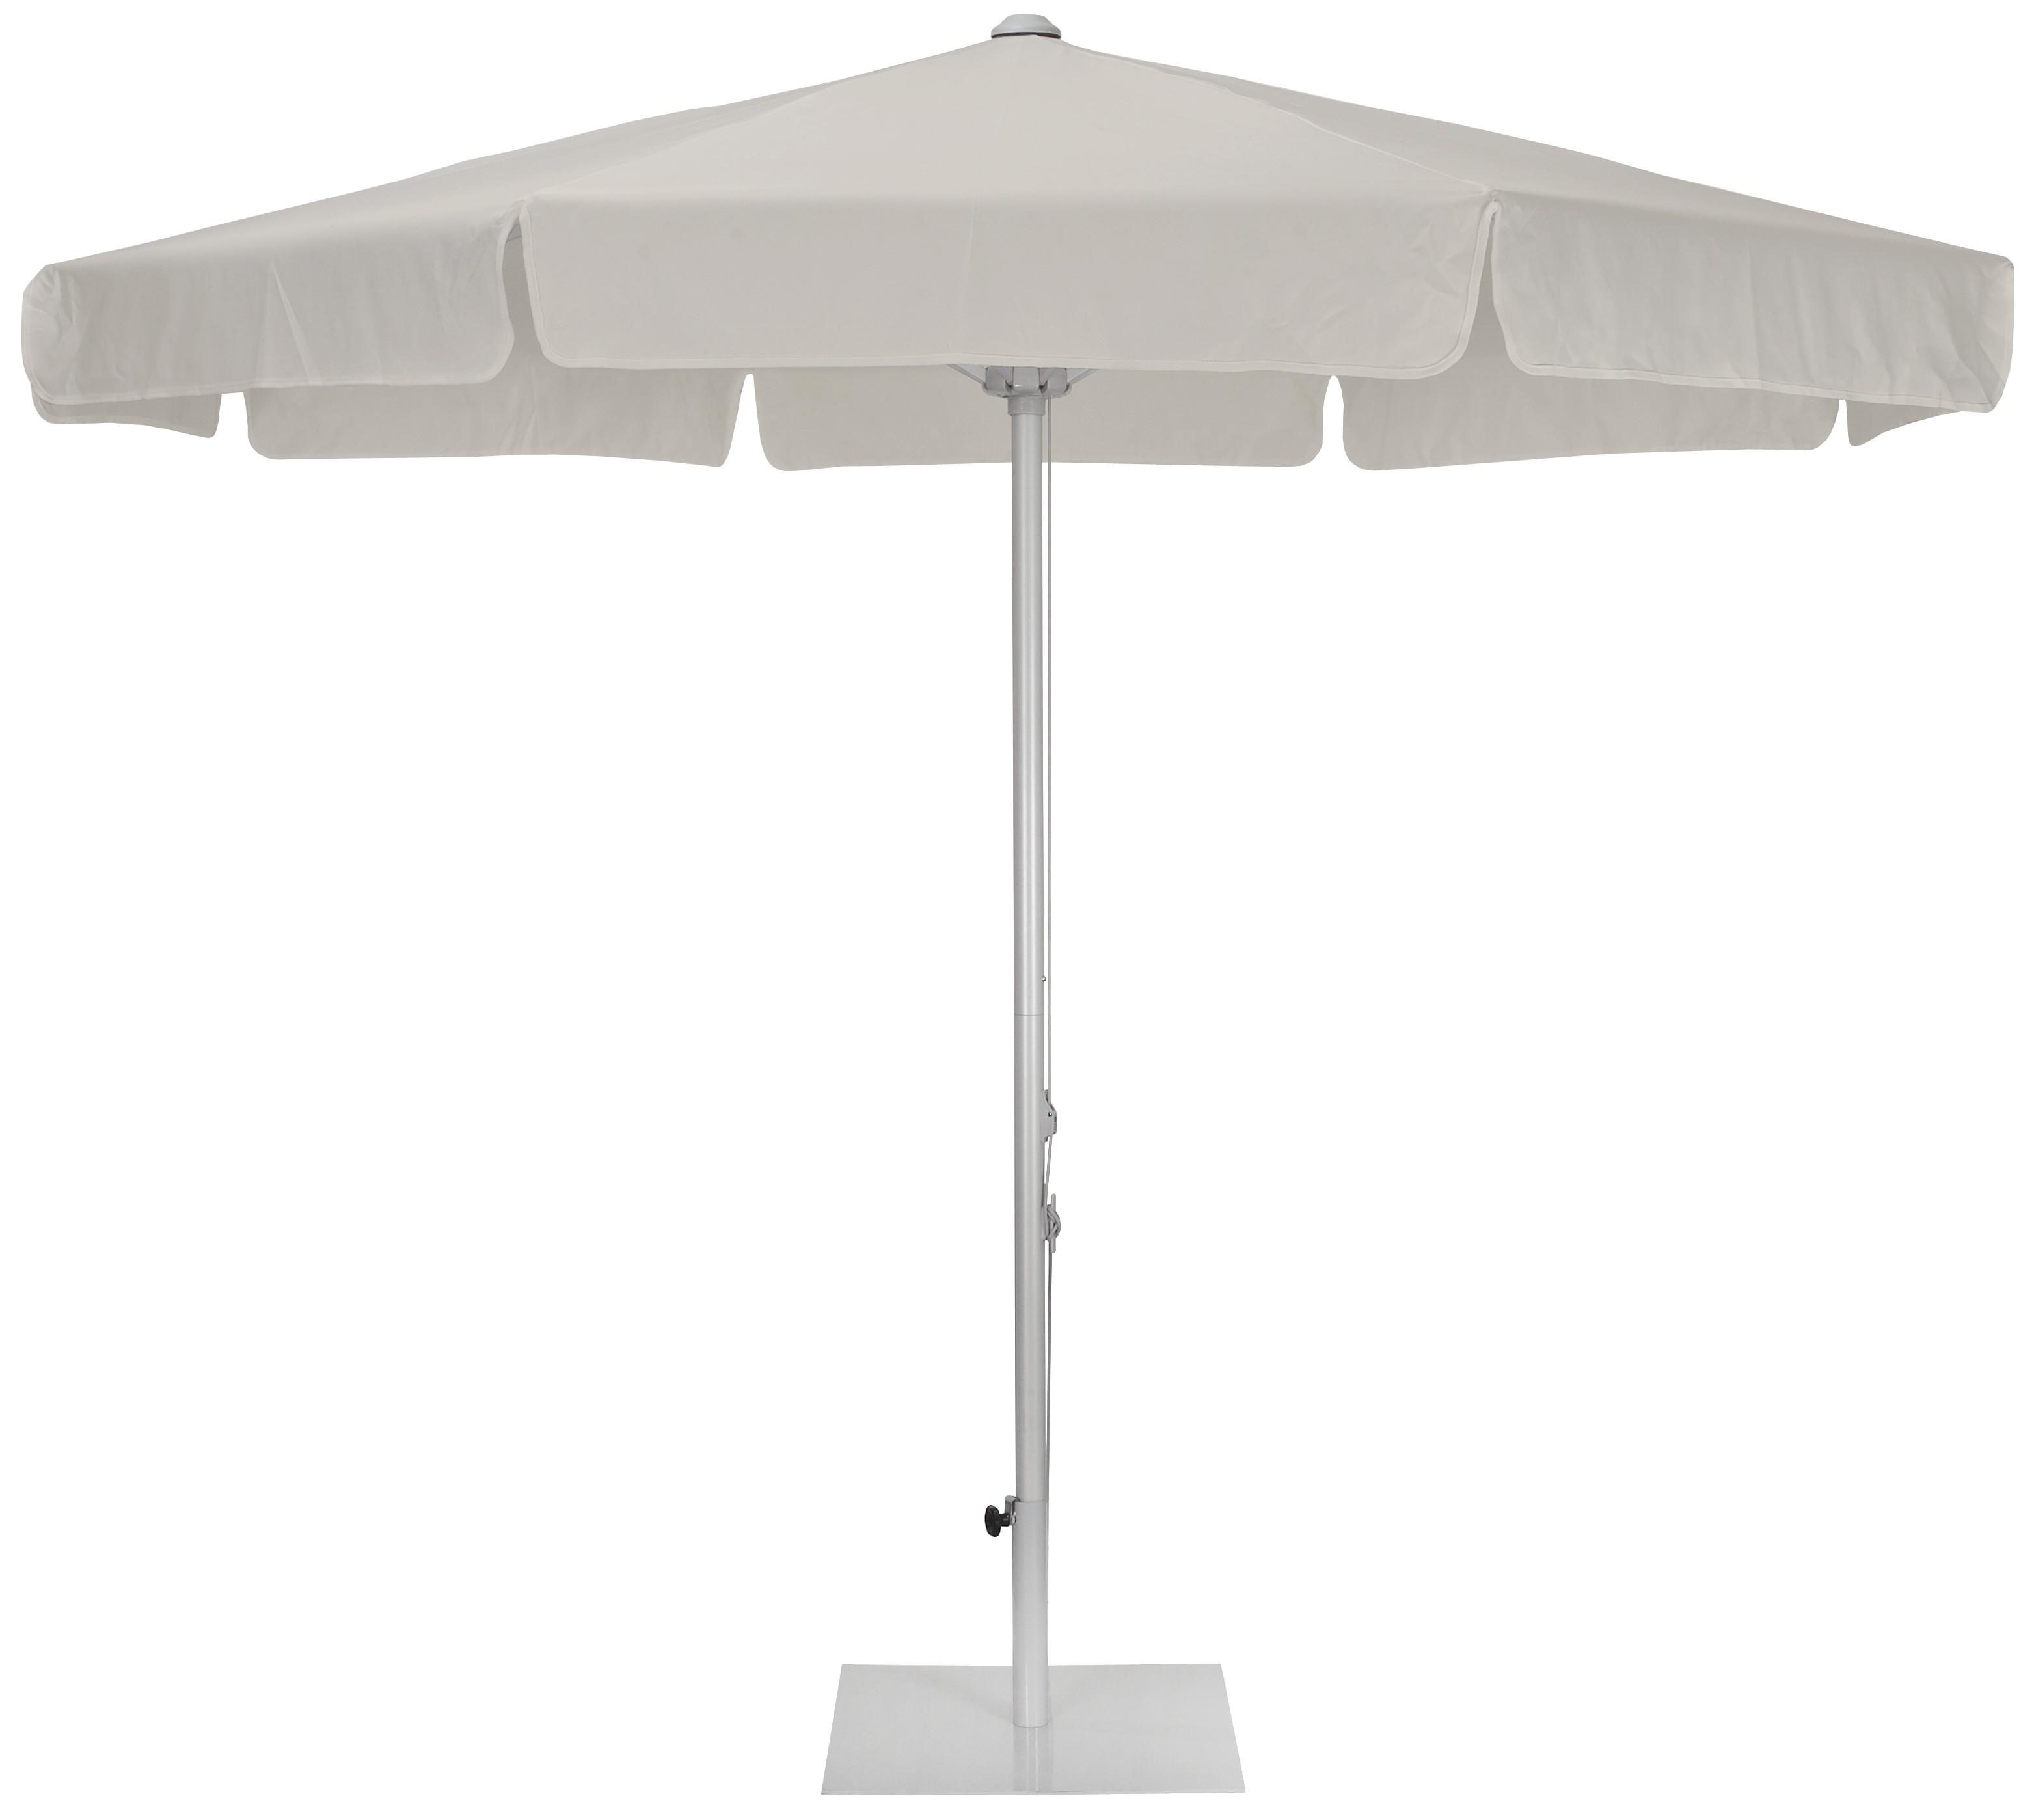 Parasol Ezpeleta Redondos Grey 1 Grises sand Olefin 3